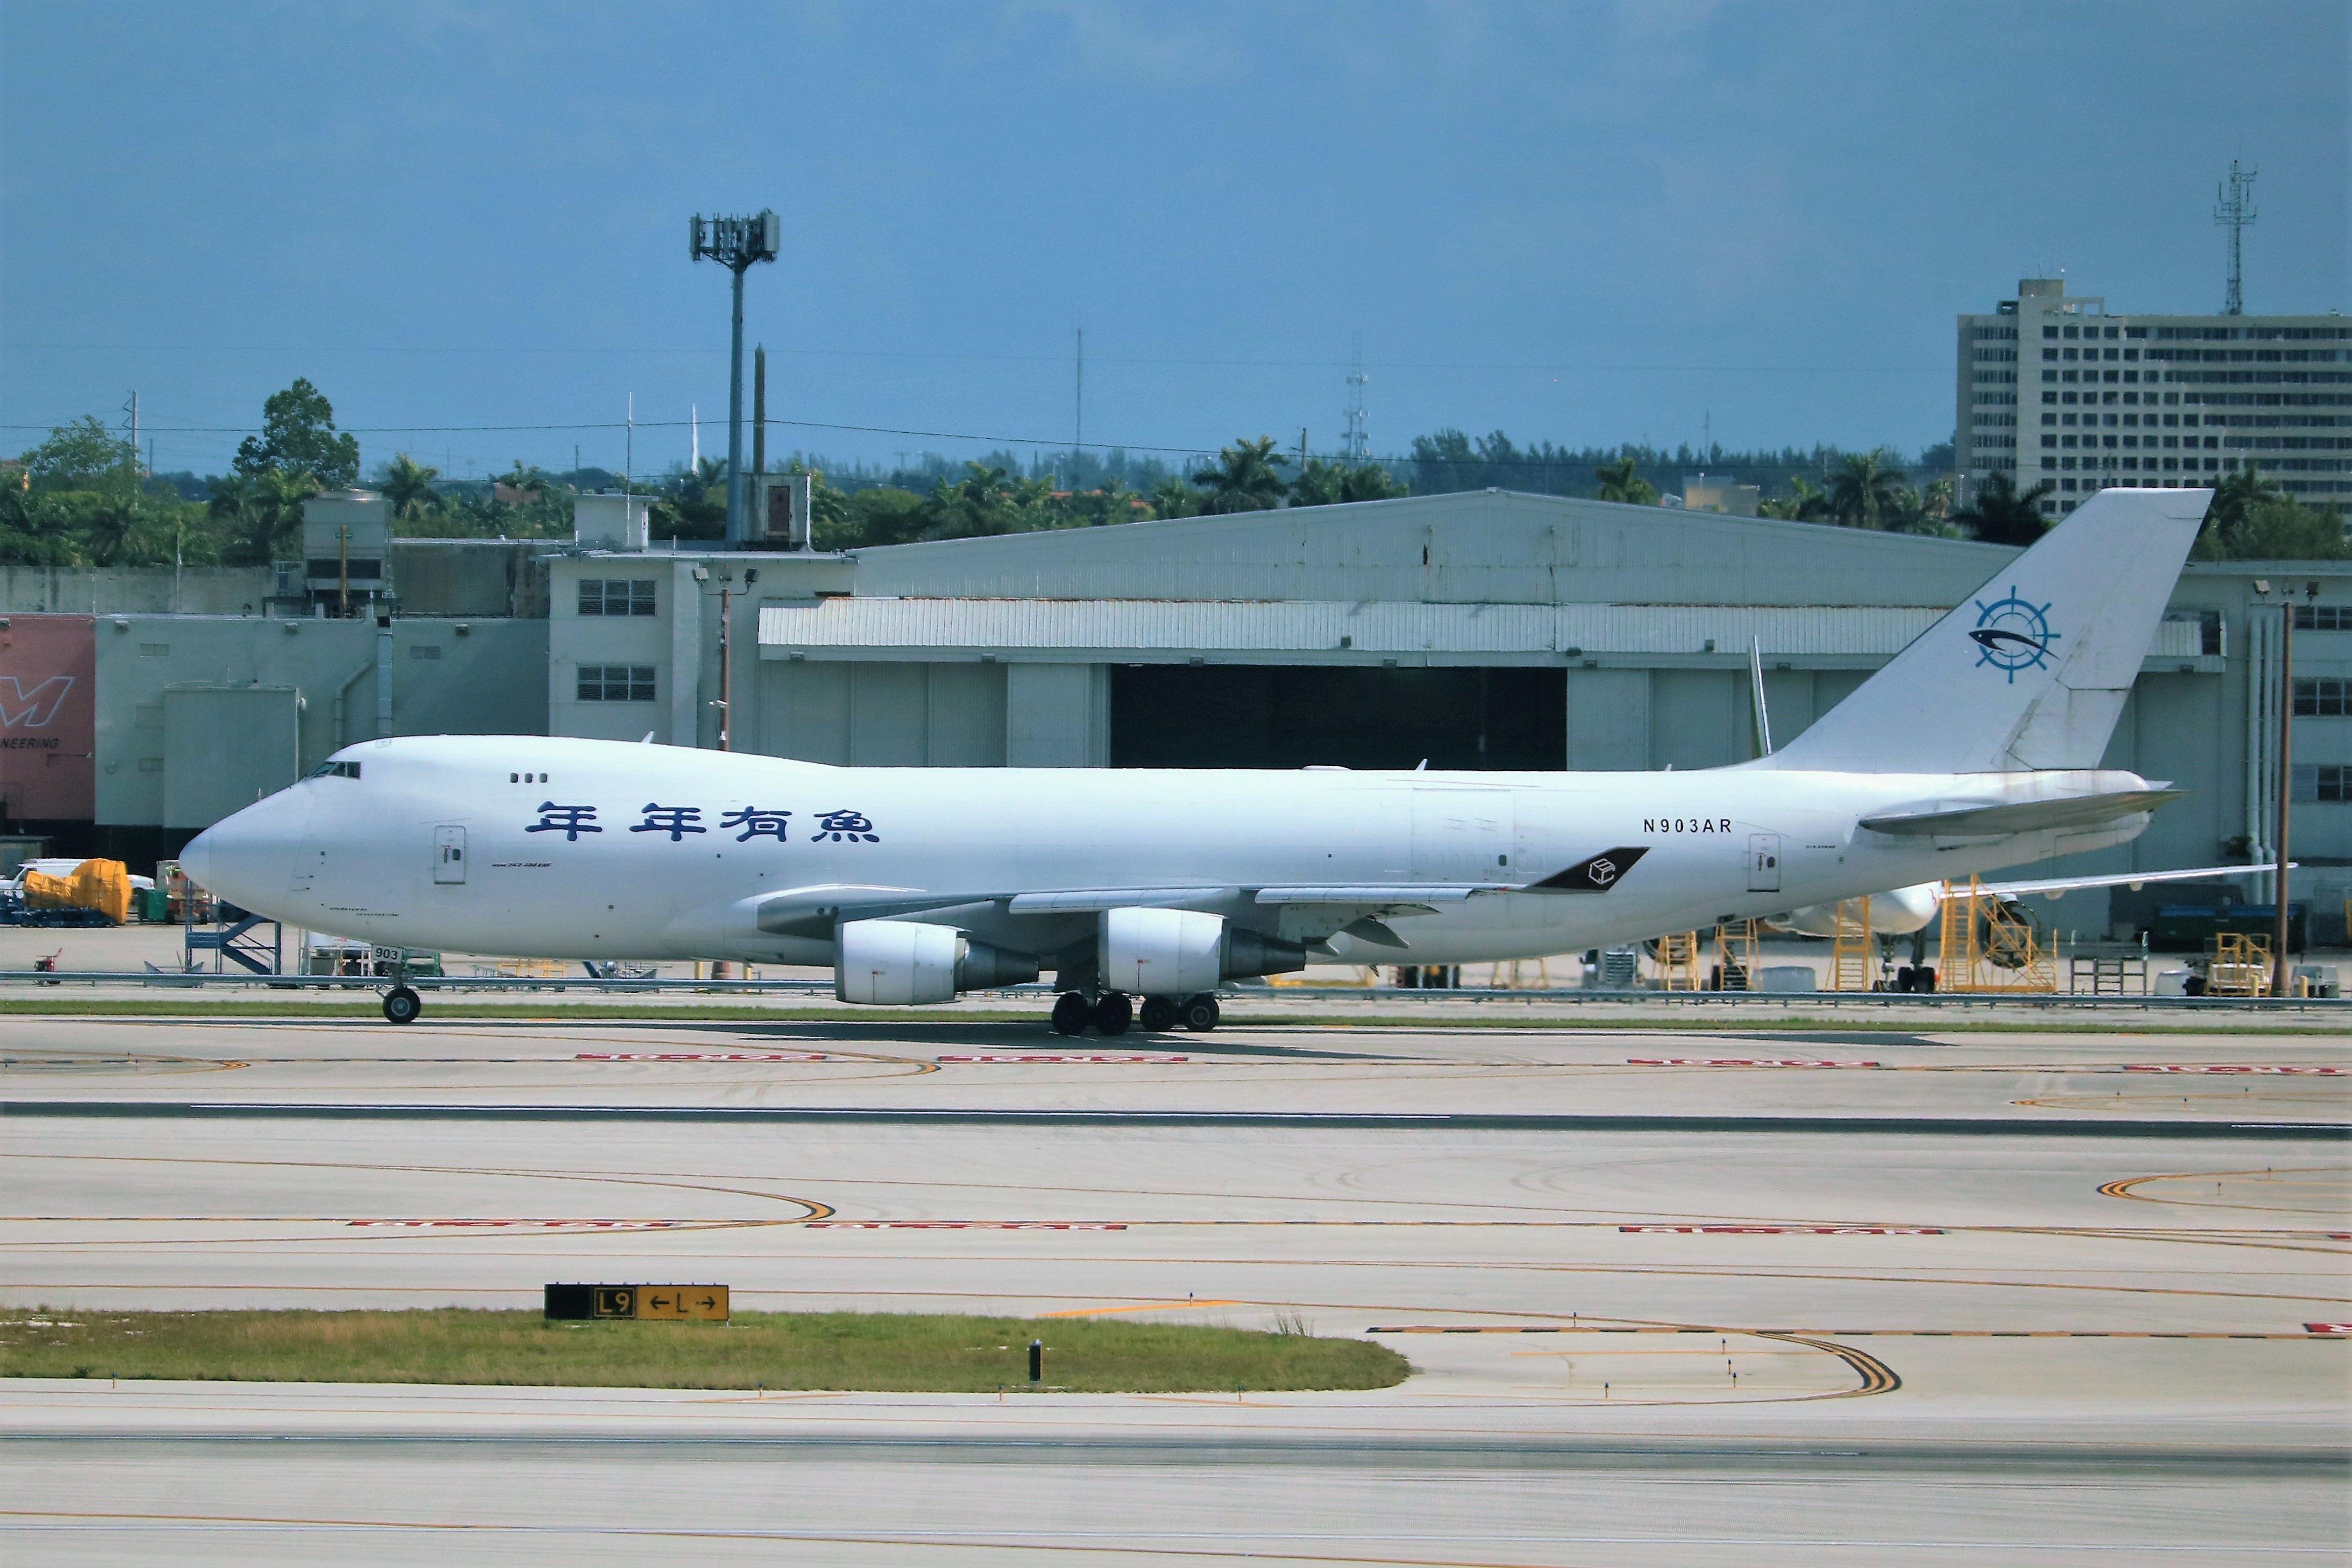 SkyLease Cargo 747 Boeing aircraft, Air france, Cargo